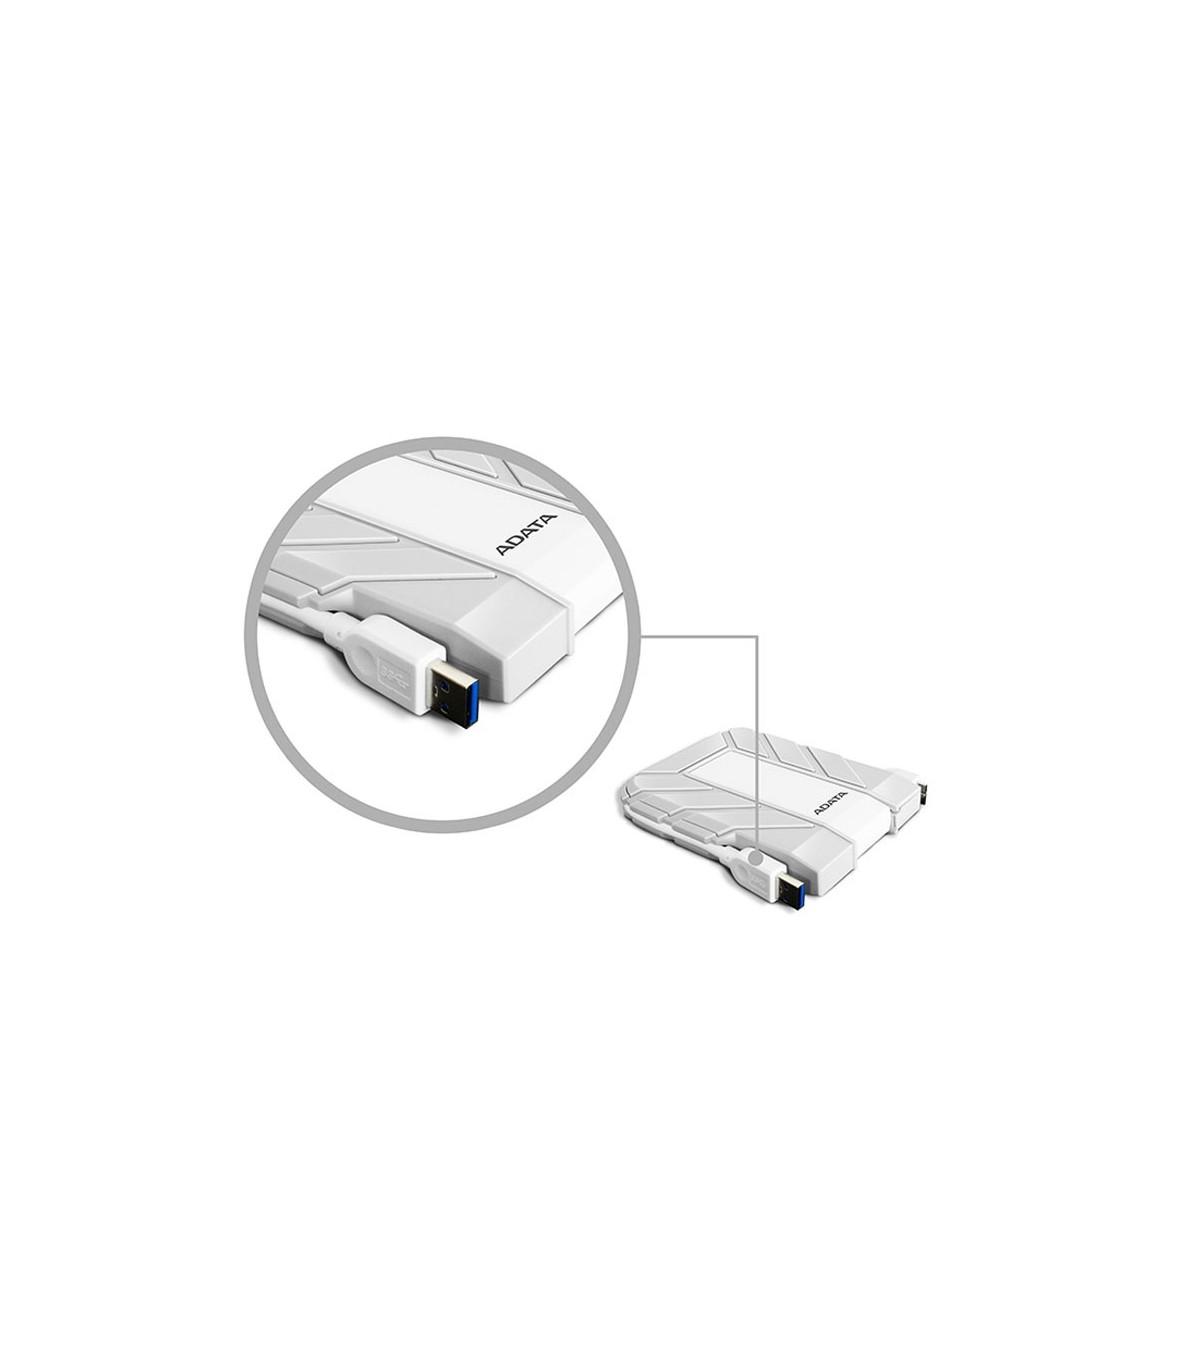 هارد اکسترنال Adata HD710A – 1TB